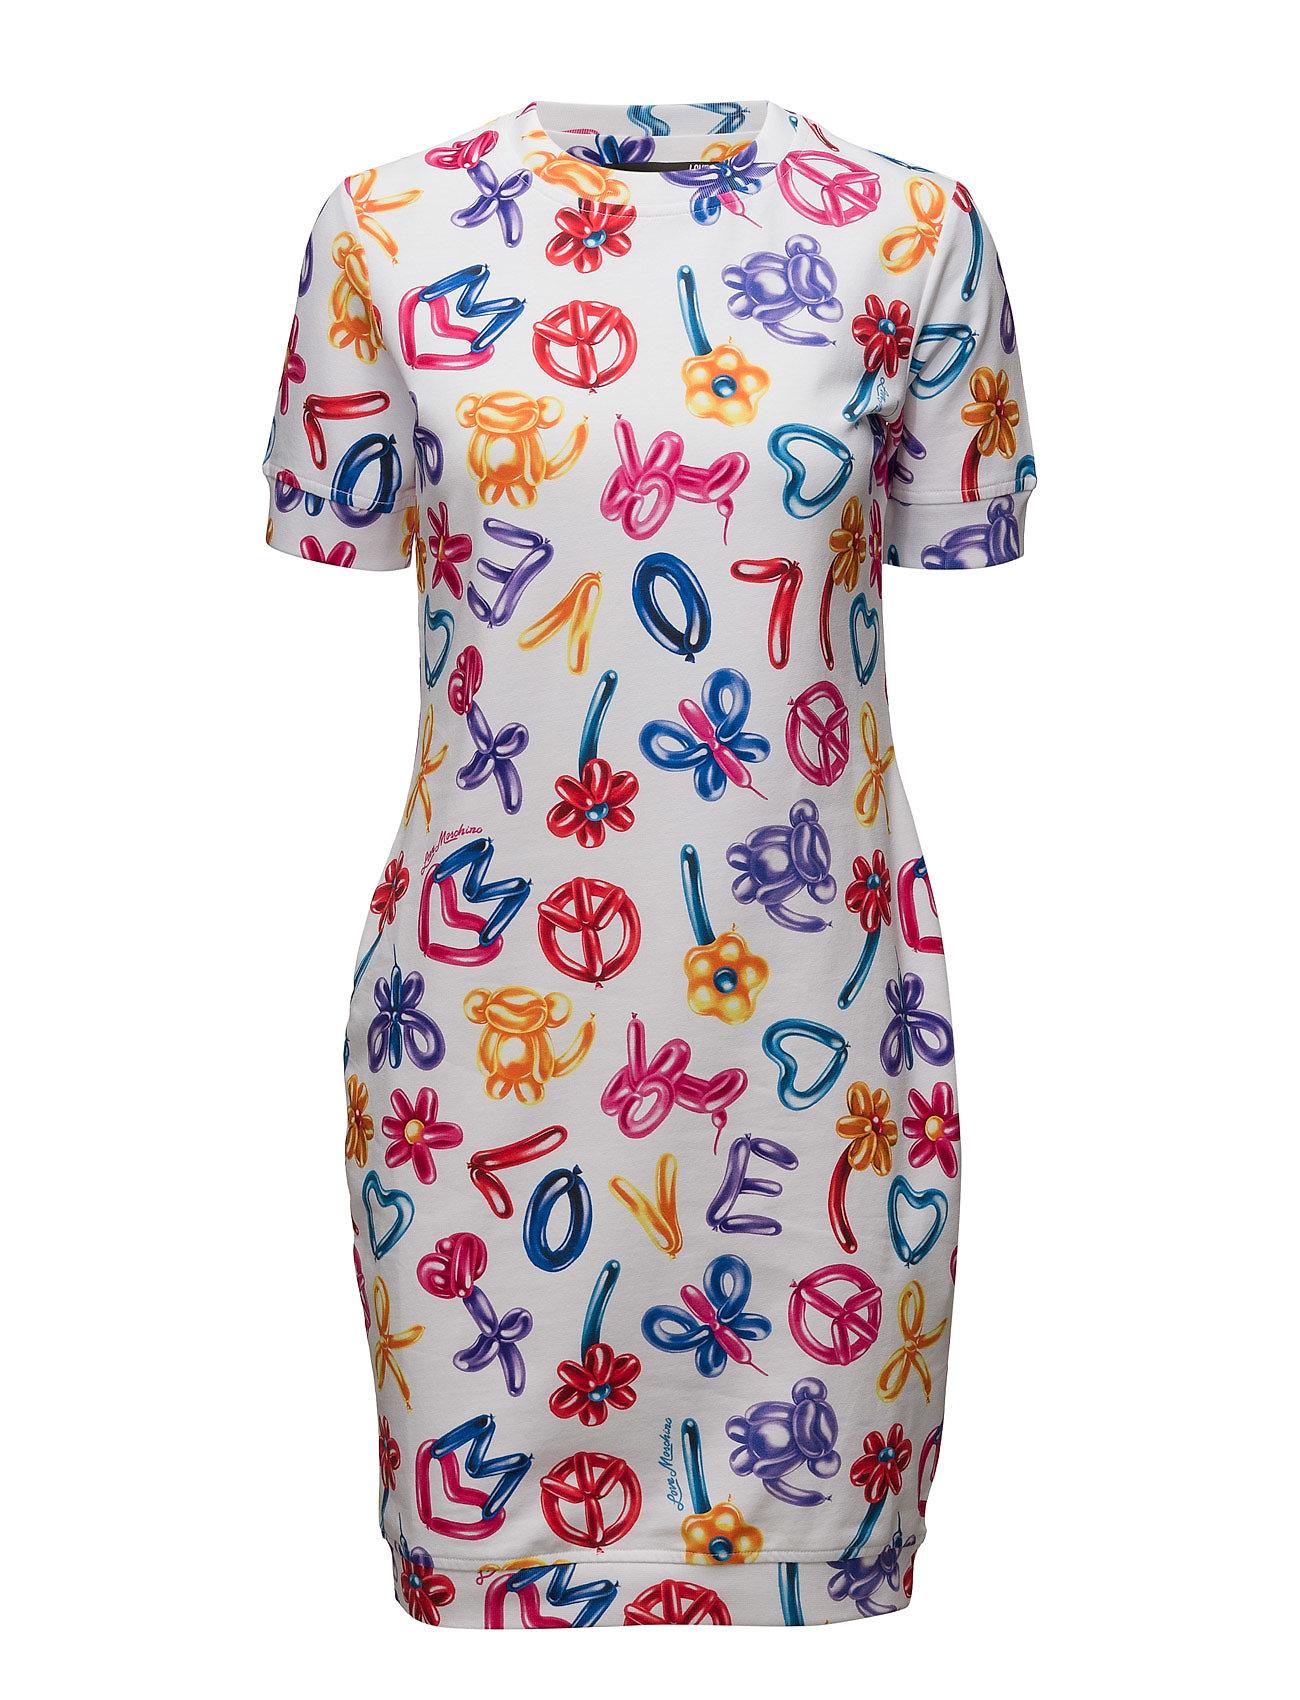 Dress Love Moschino Kjoler til Kvinder i hvid